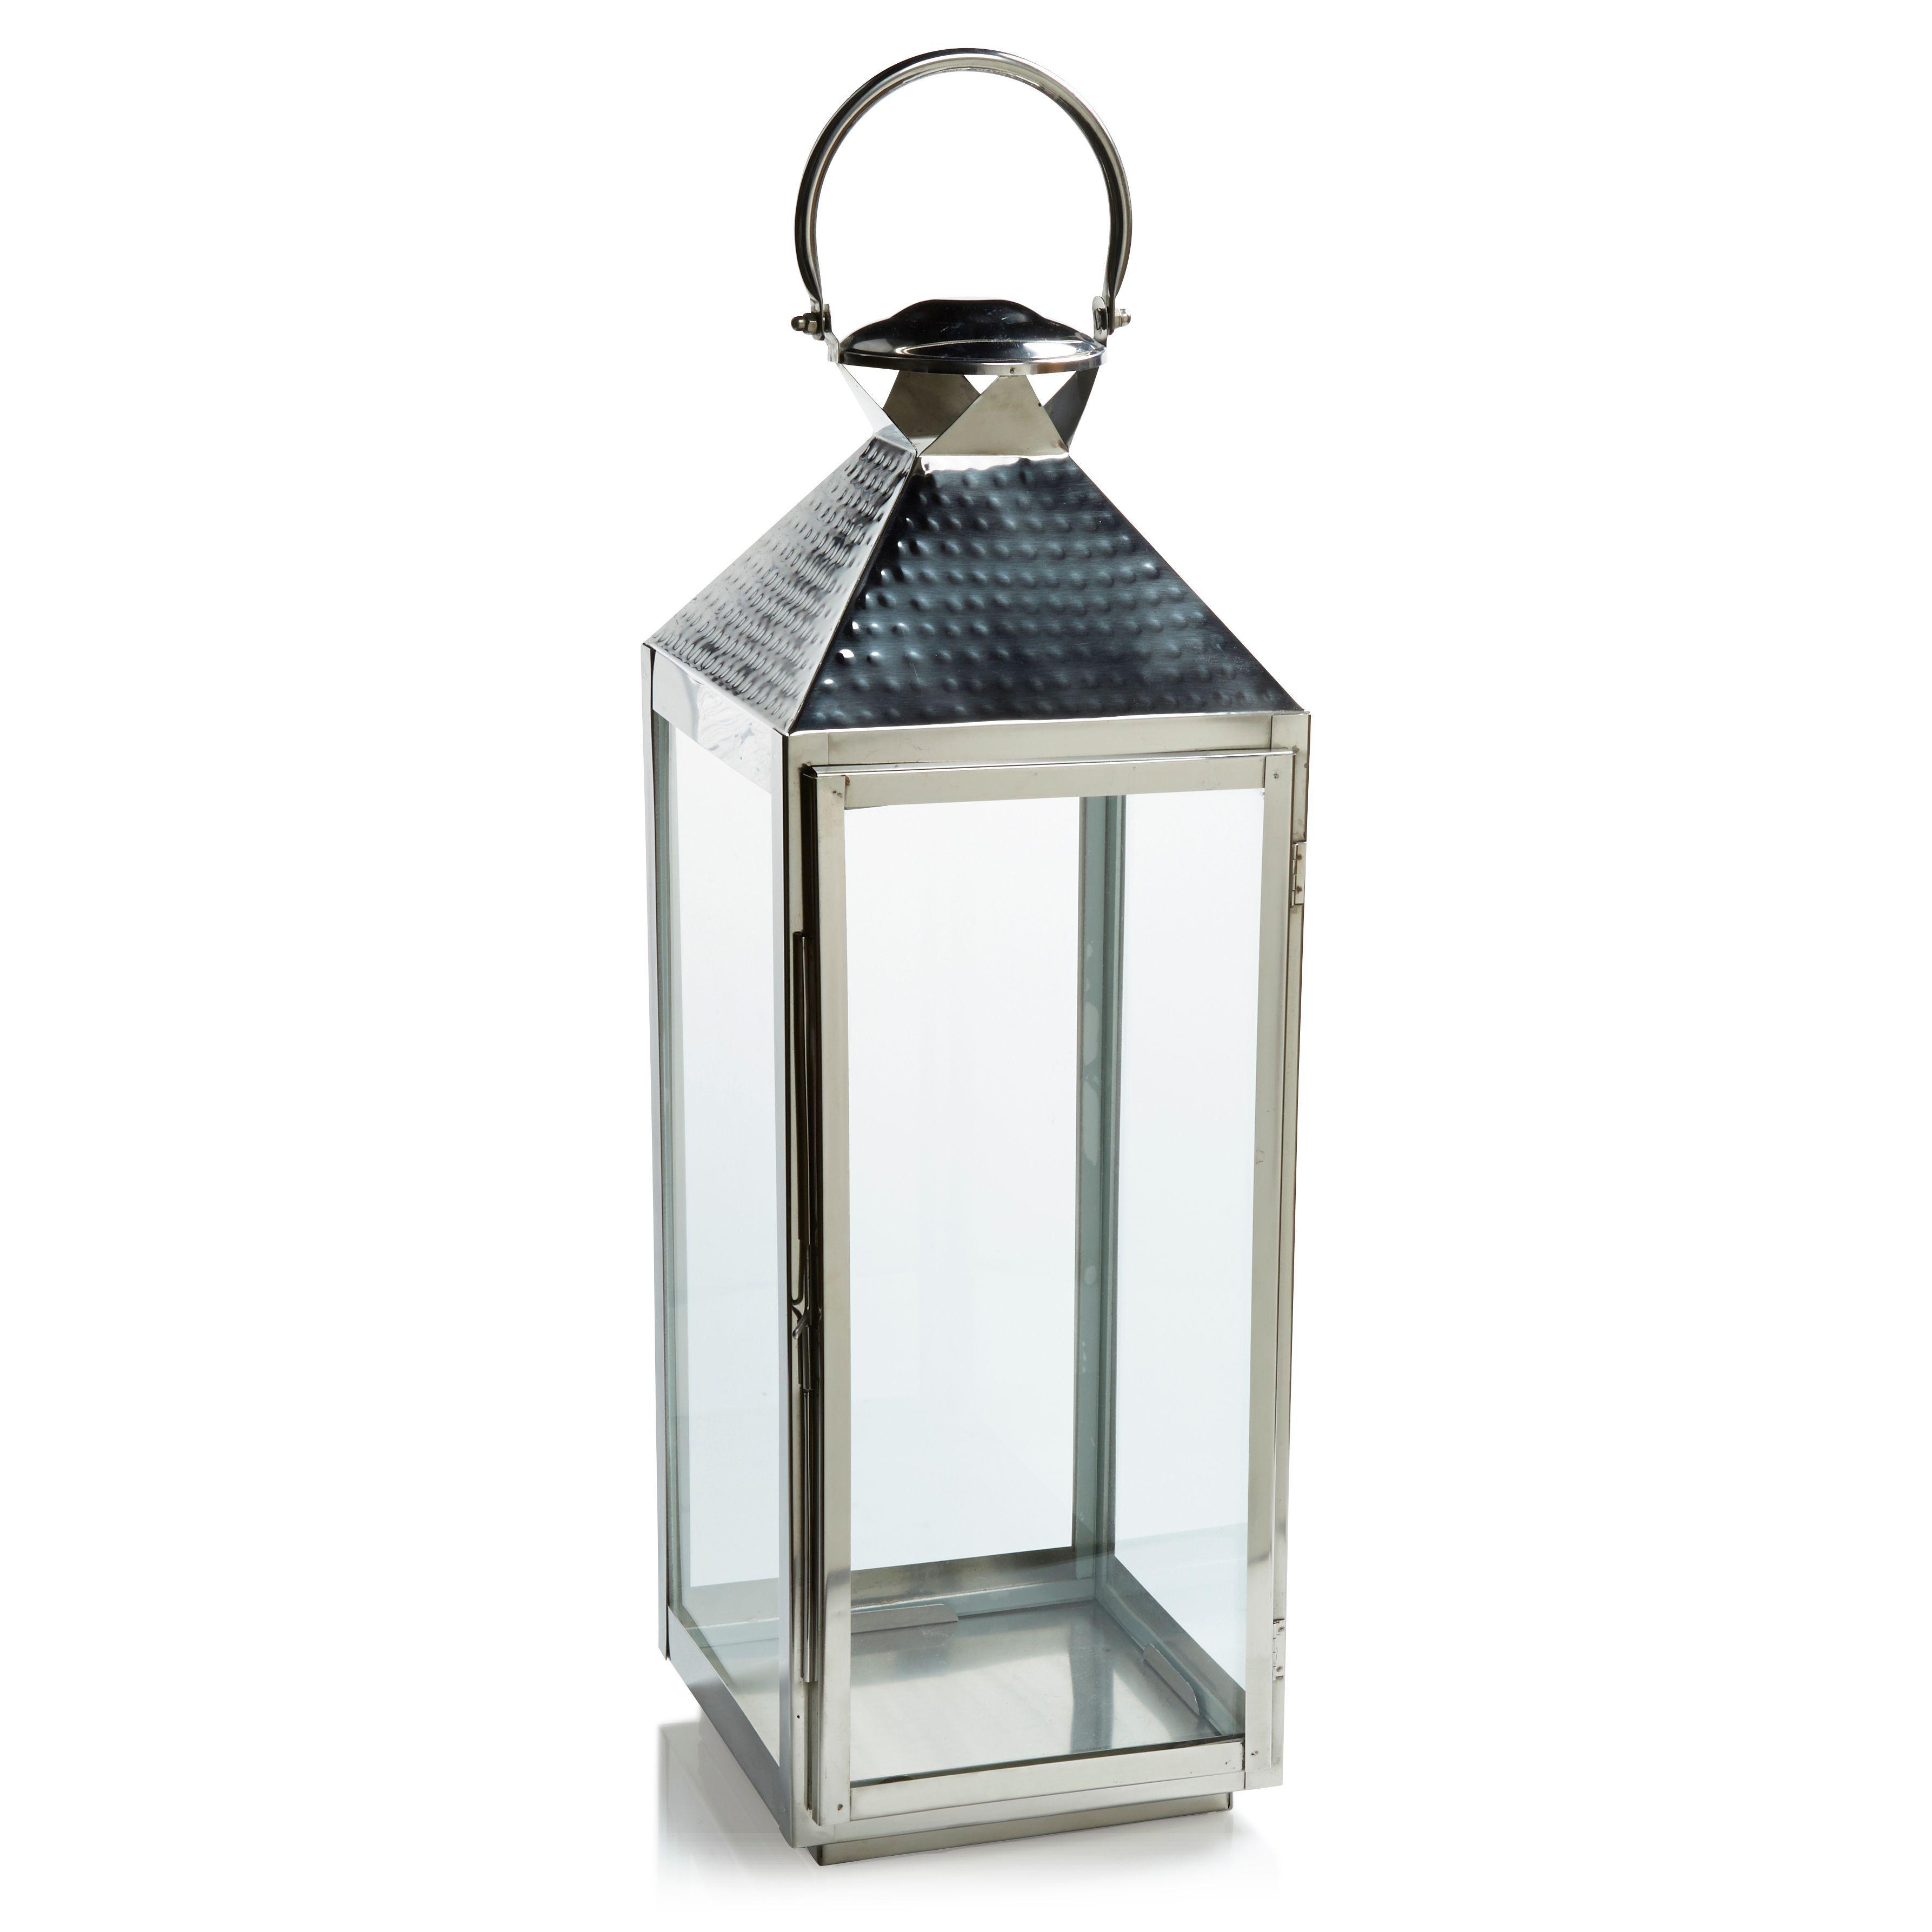 Colours Chrome Effect Stainless Steel U0026 Glass Hurricane Lantern, Extra Large